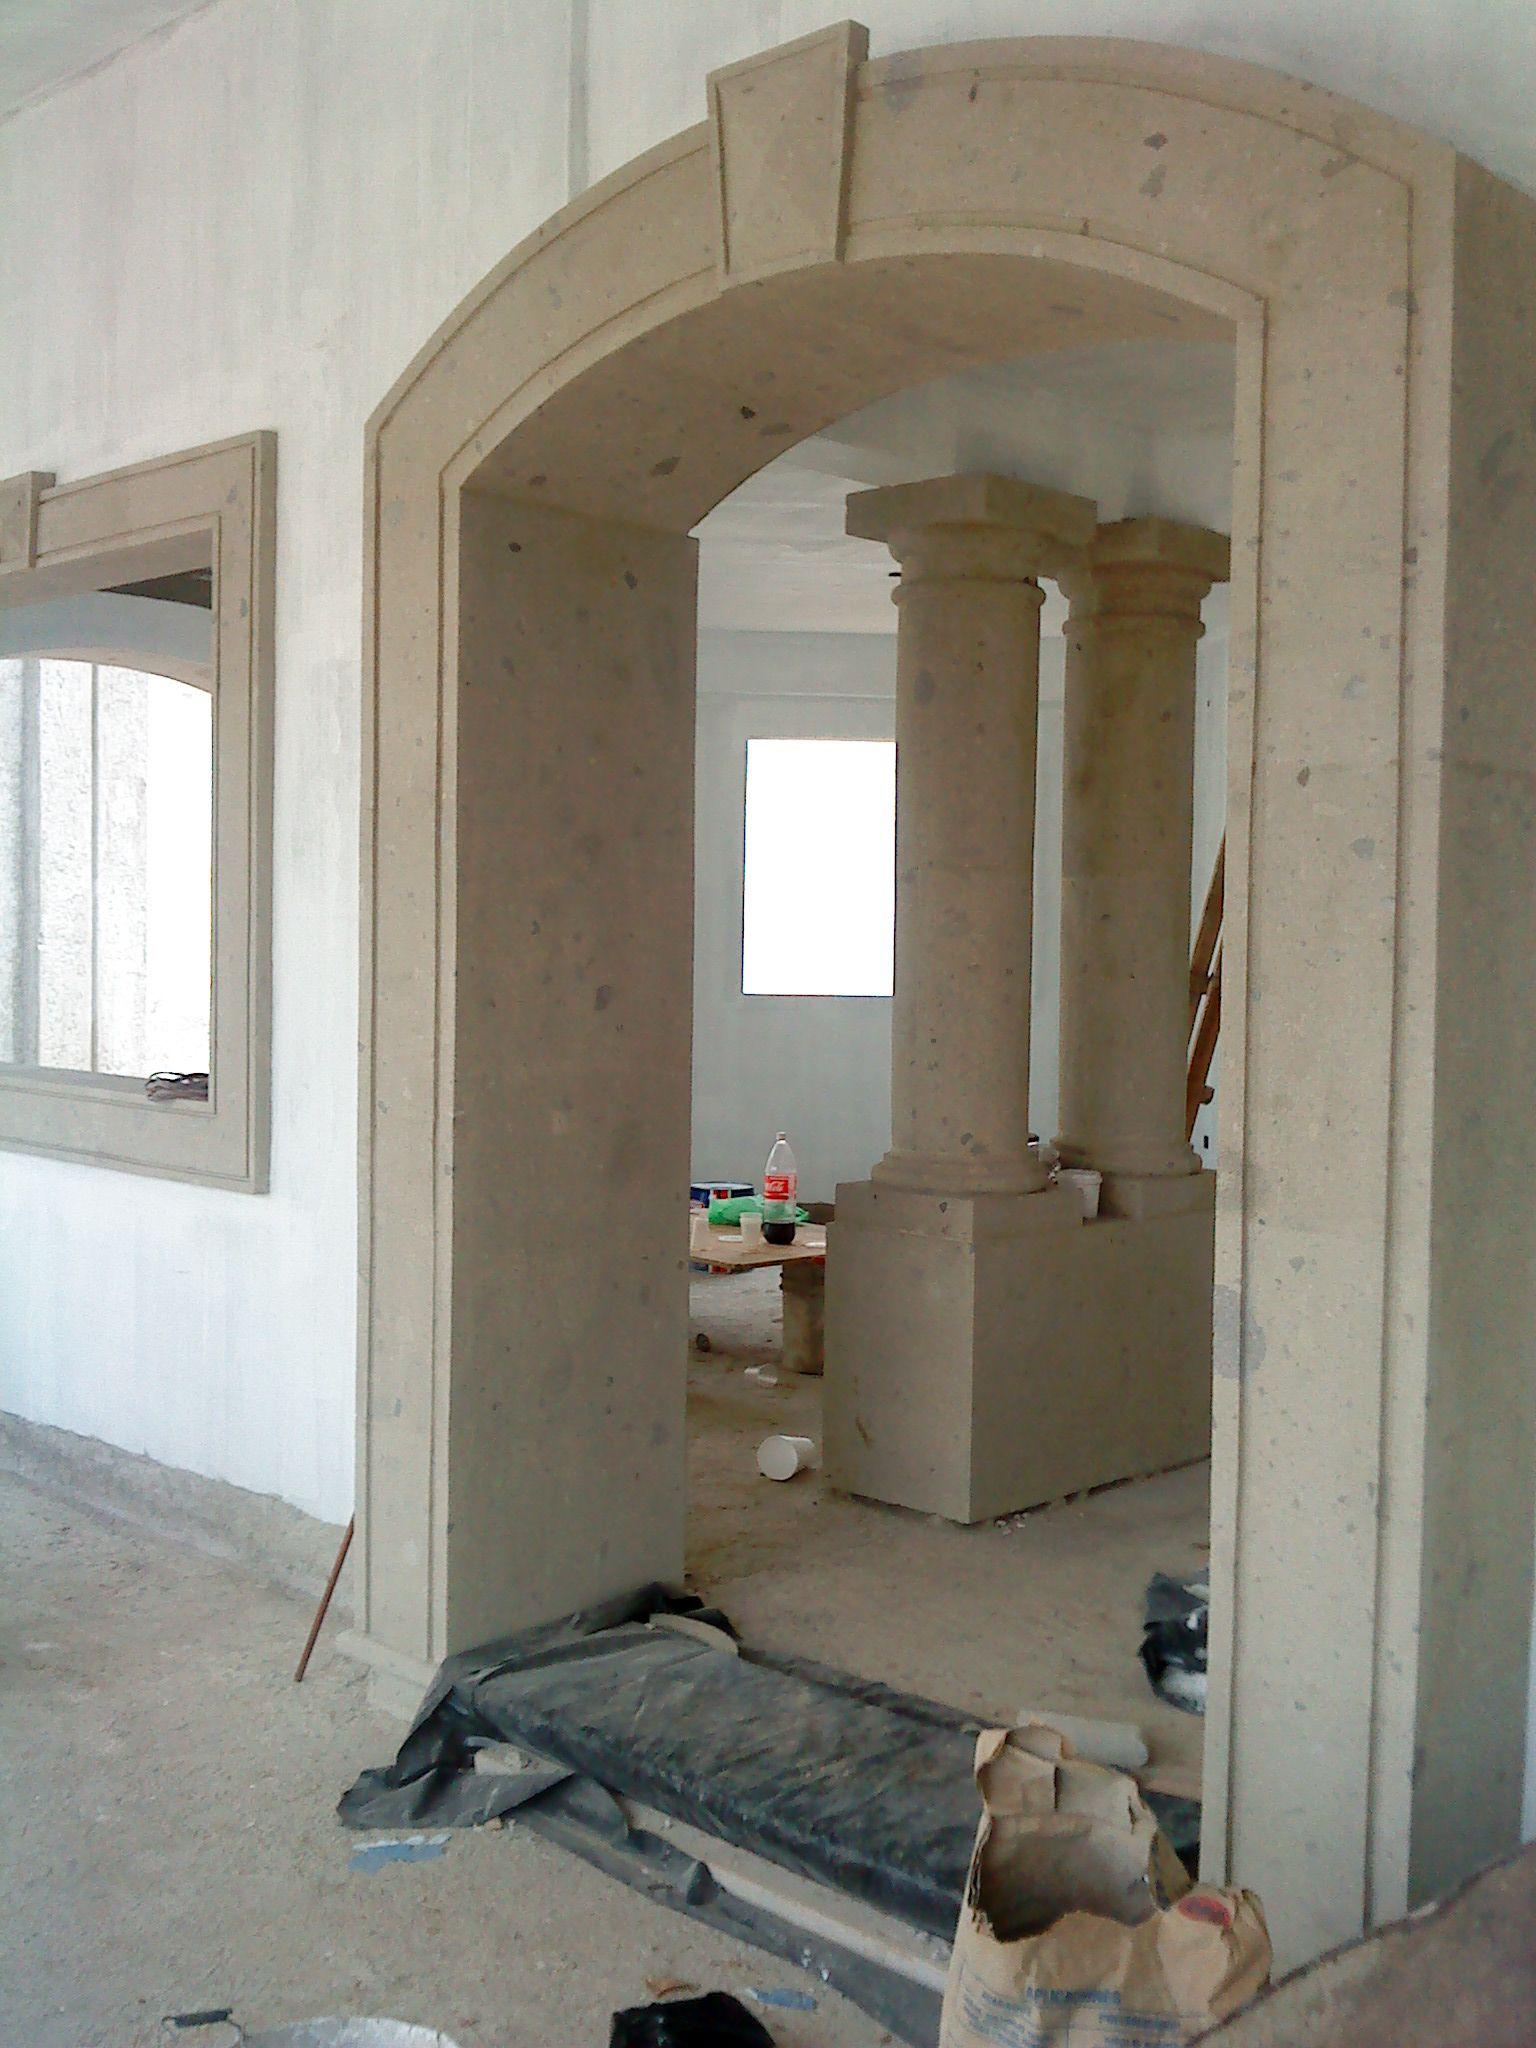 Peque a vivienda estilo tradicional exteriores r sticos e for Decoracion de la puerta de entrada